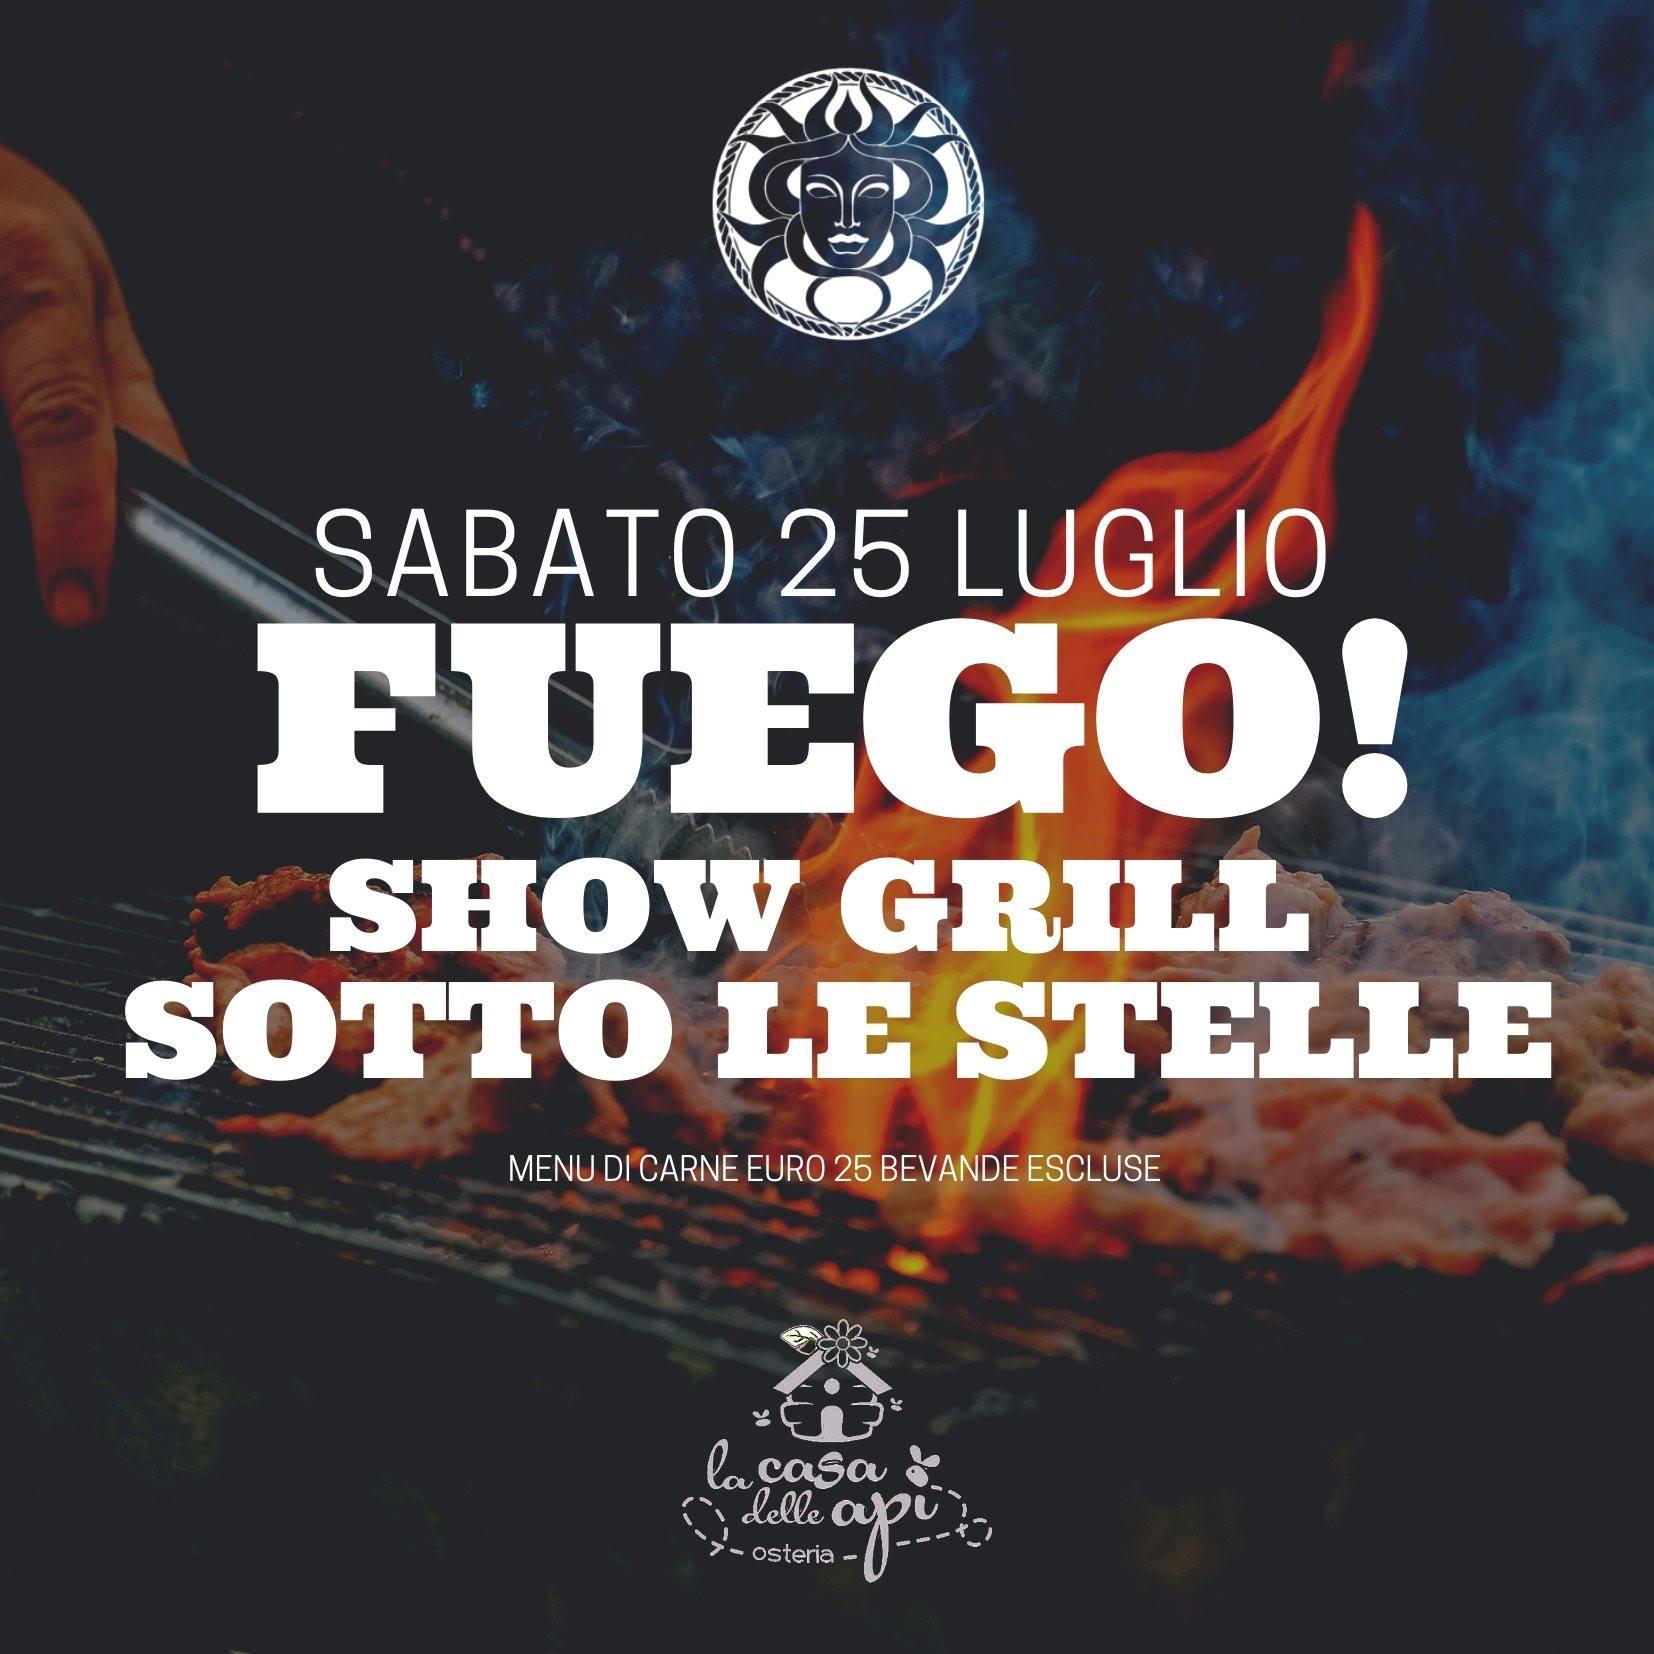 Fuego Bagni Medusa San Benedetto Del Tronto